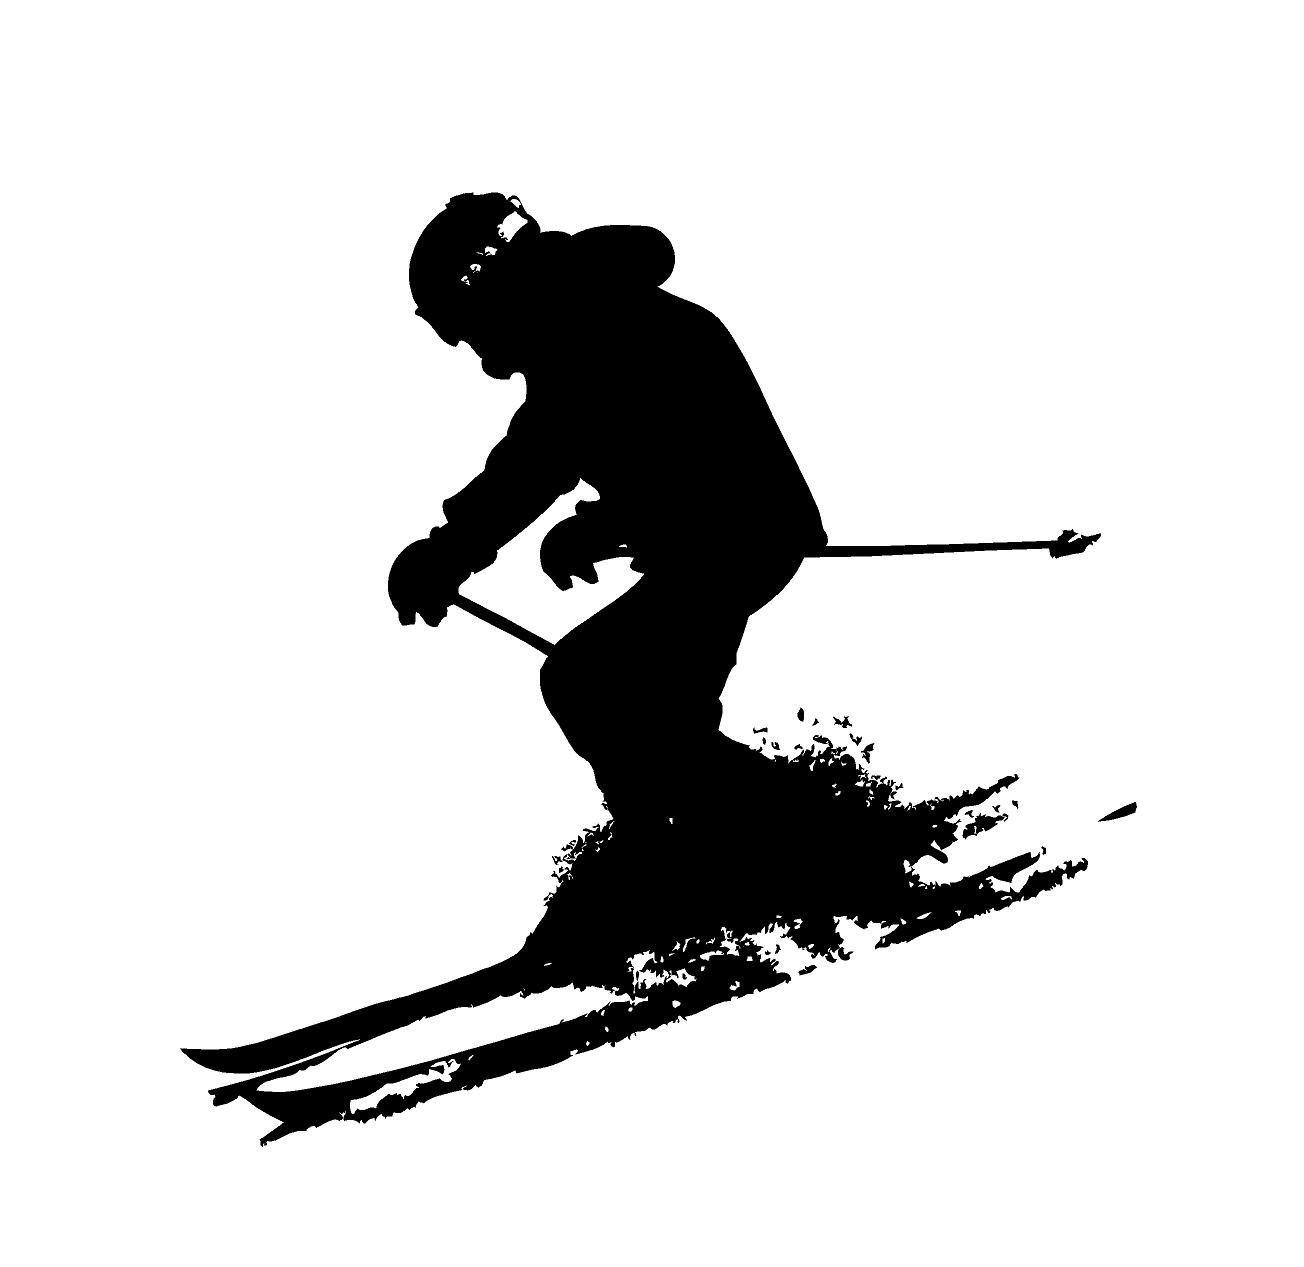 Snow Skier Decal Snow Skiing Decal Snow Ski Decal Snow Skier Car Decals Snow Skier Car Decal Down Hill Skier Snow Sk Custom Vinyl Decal Custom Vinyl Usmc Decal [ 1267 x 1304 Pixel ]